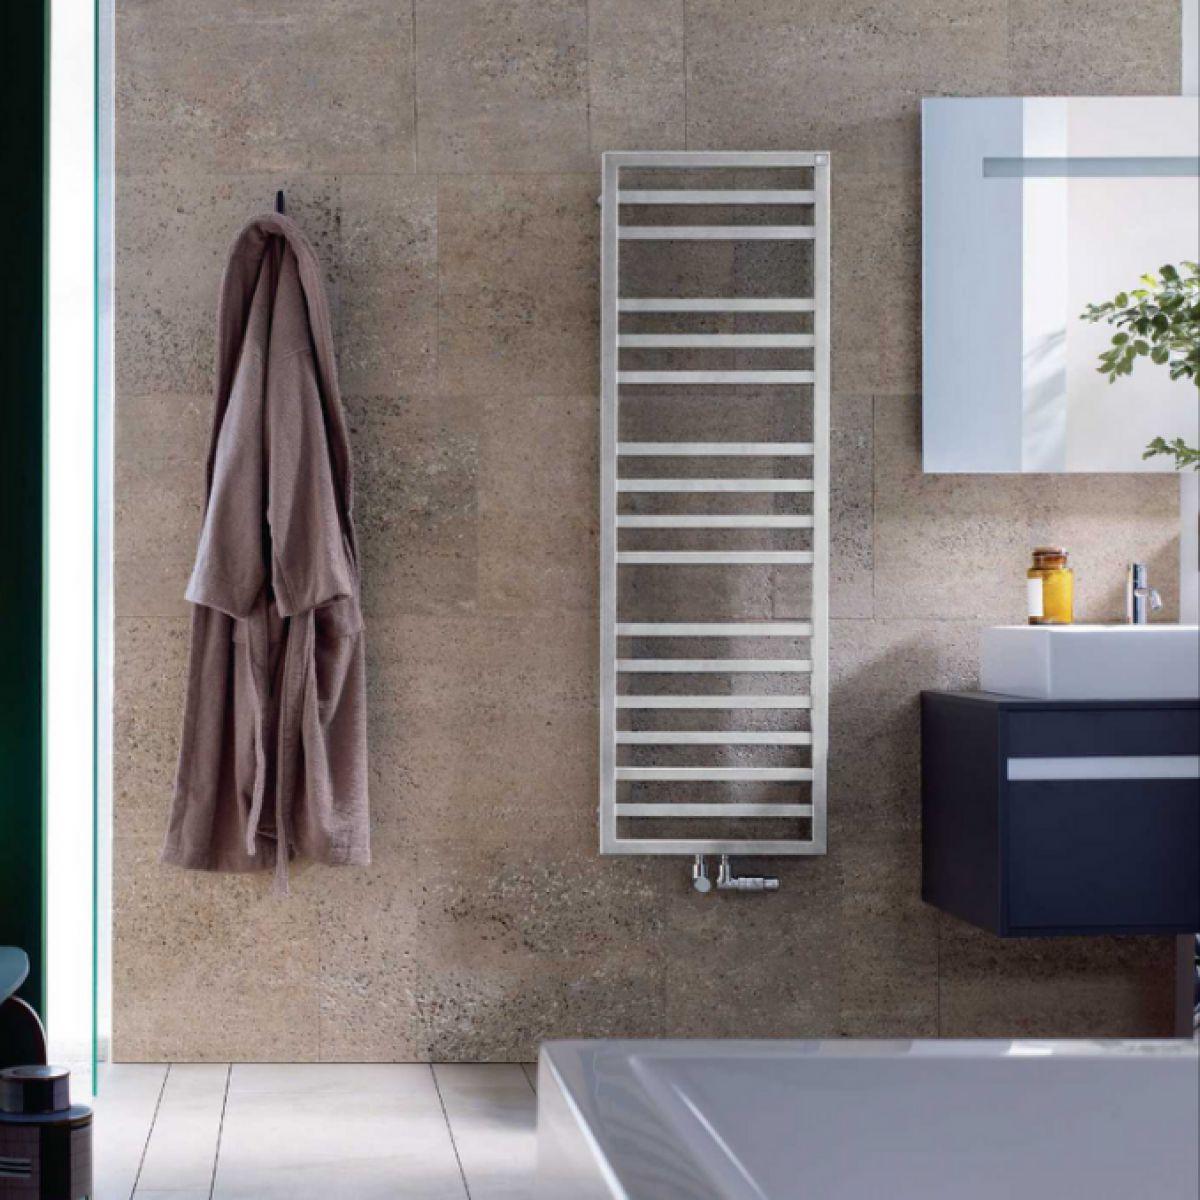 Zehnder Quaro Spa Towel Drying Radiator Uk Bathrooms